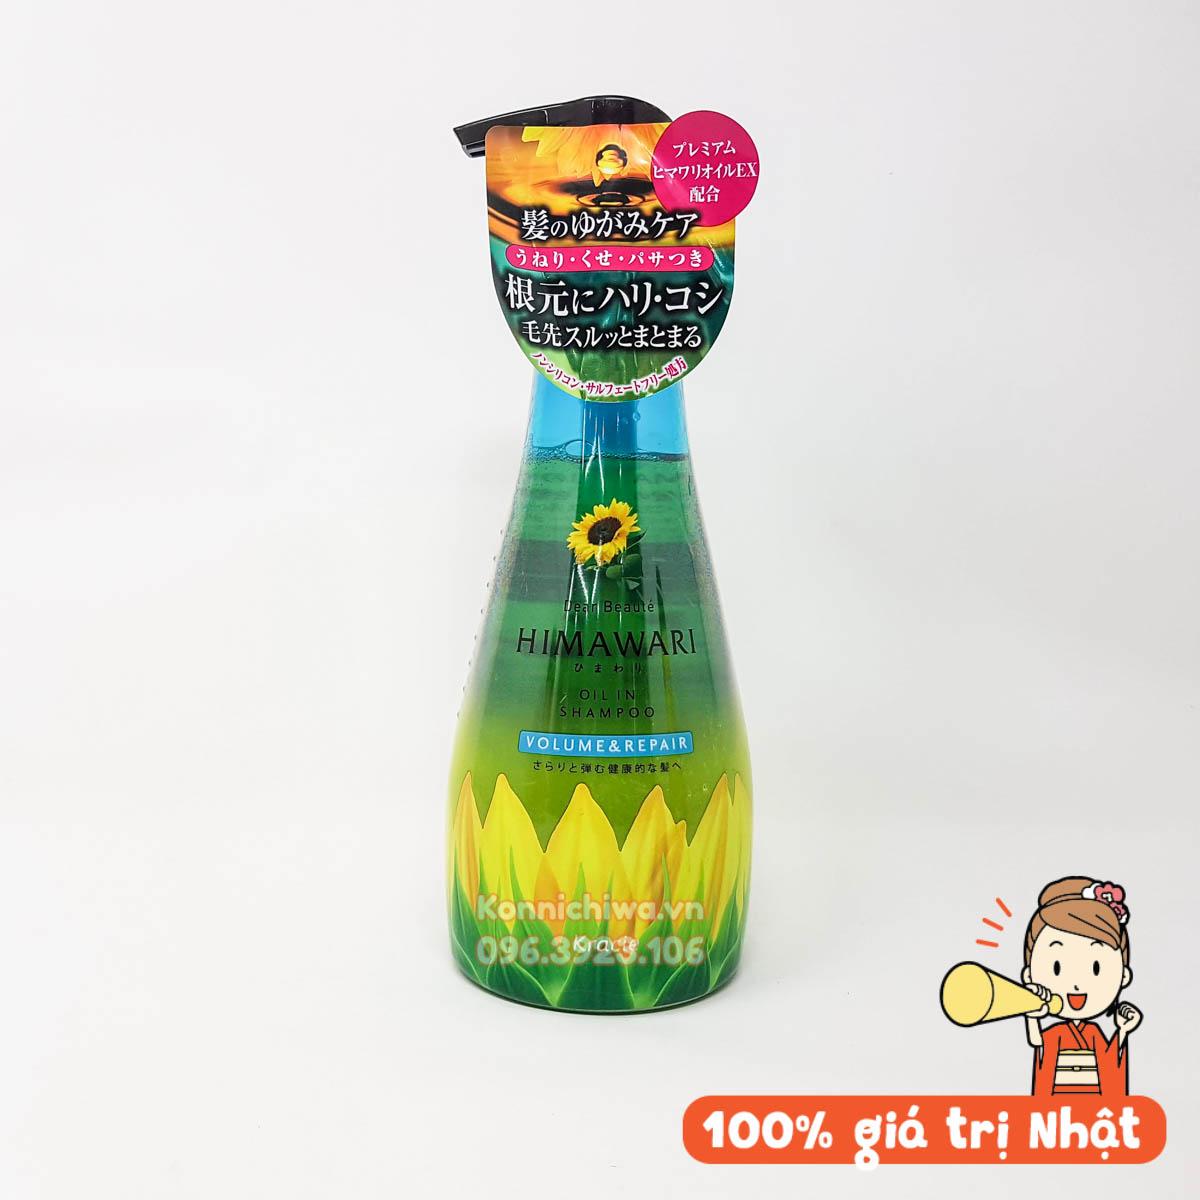 dau-goi-himawari-ho-tro-phuc-hoi-va-lam-day-toc-500ml